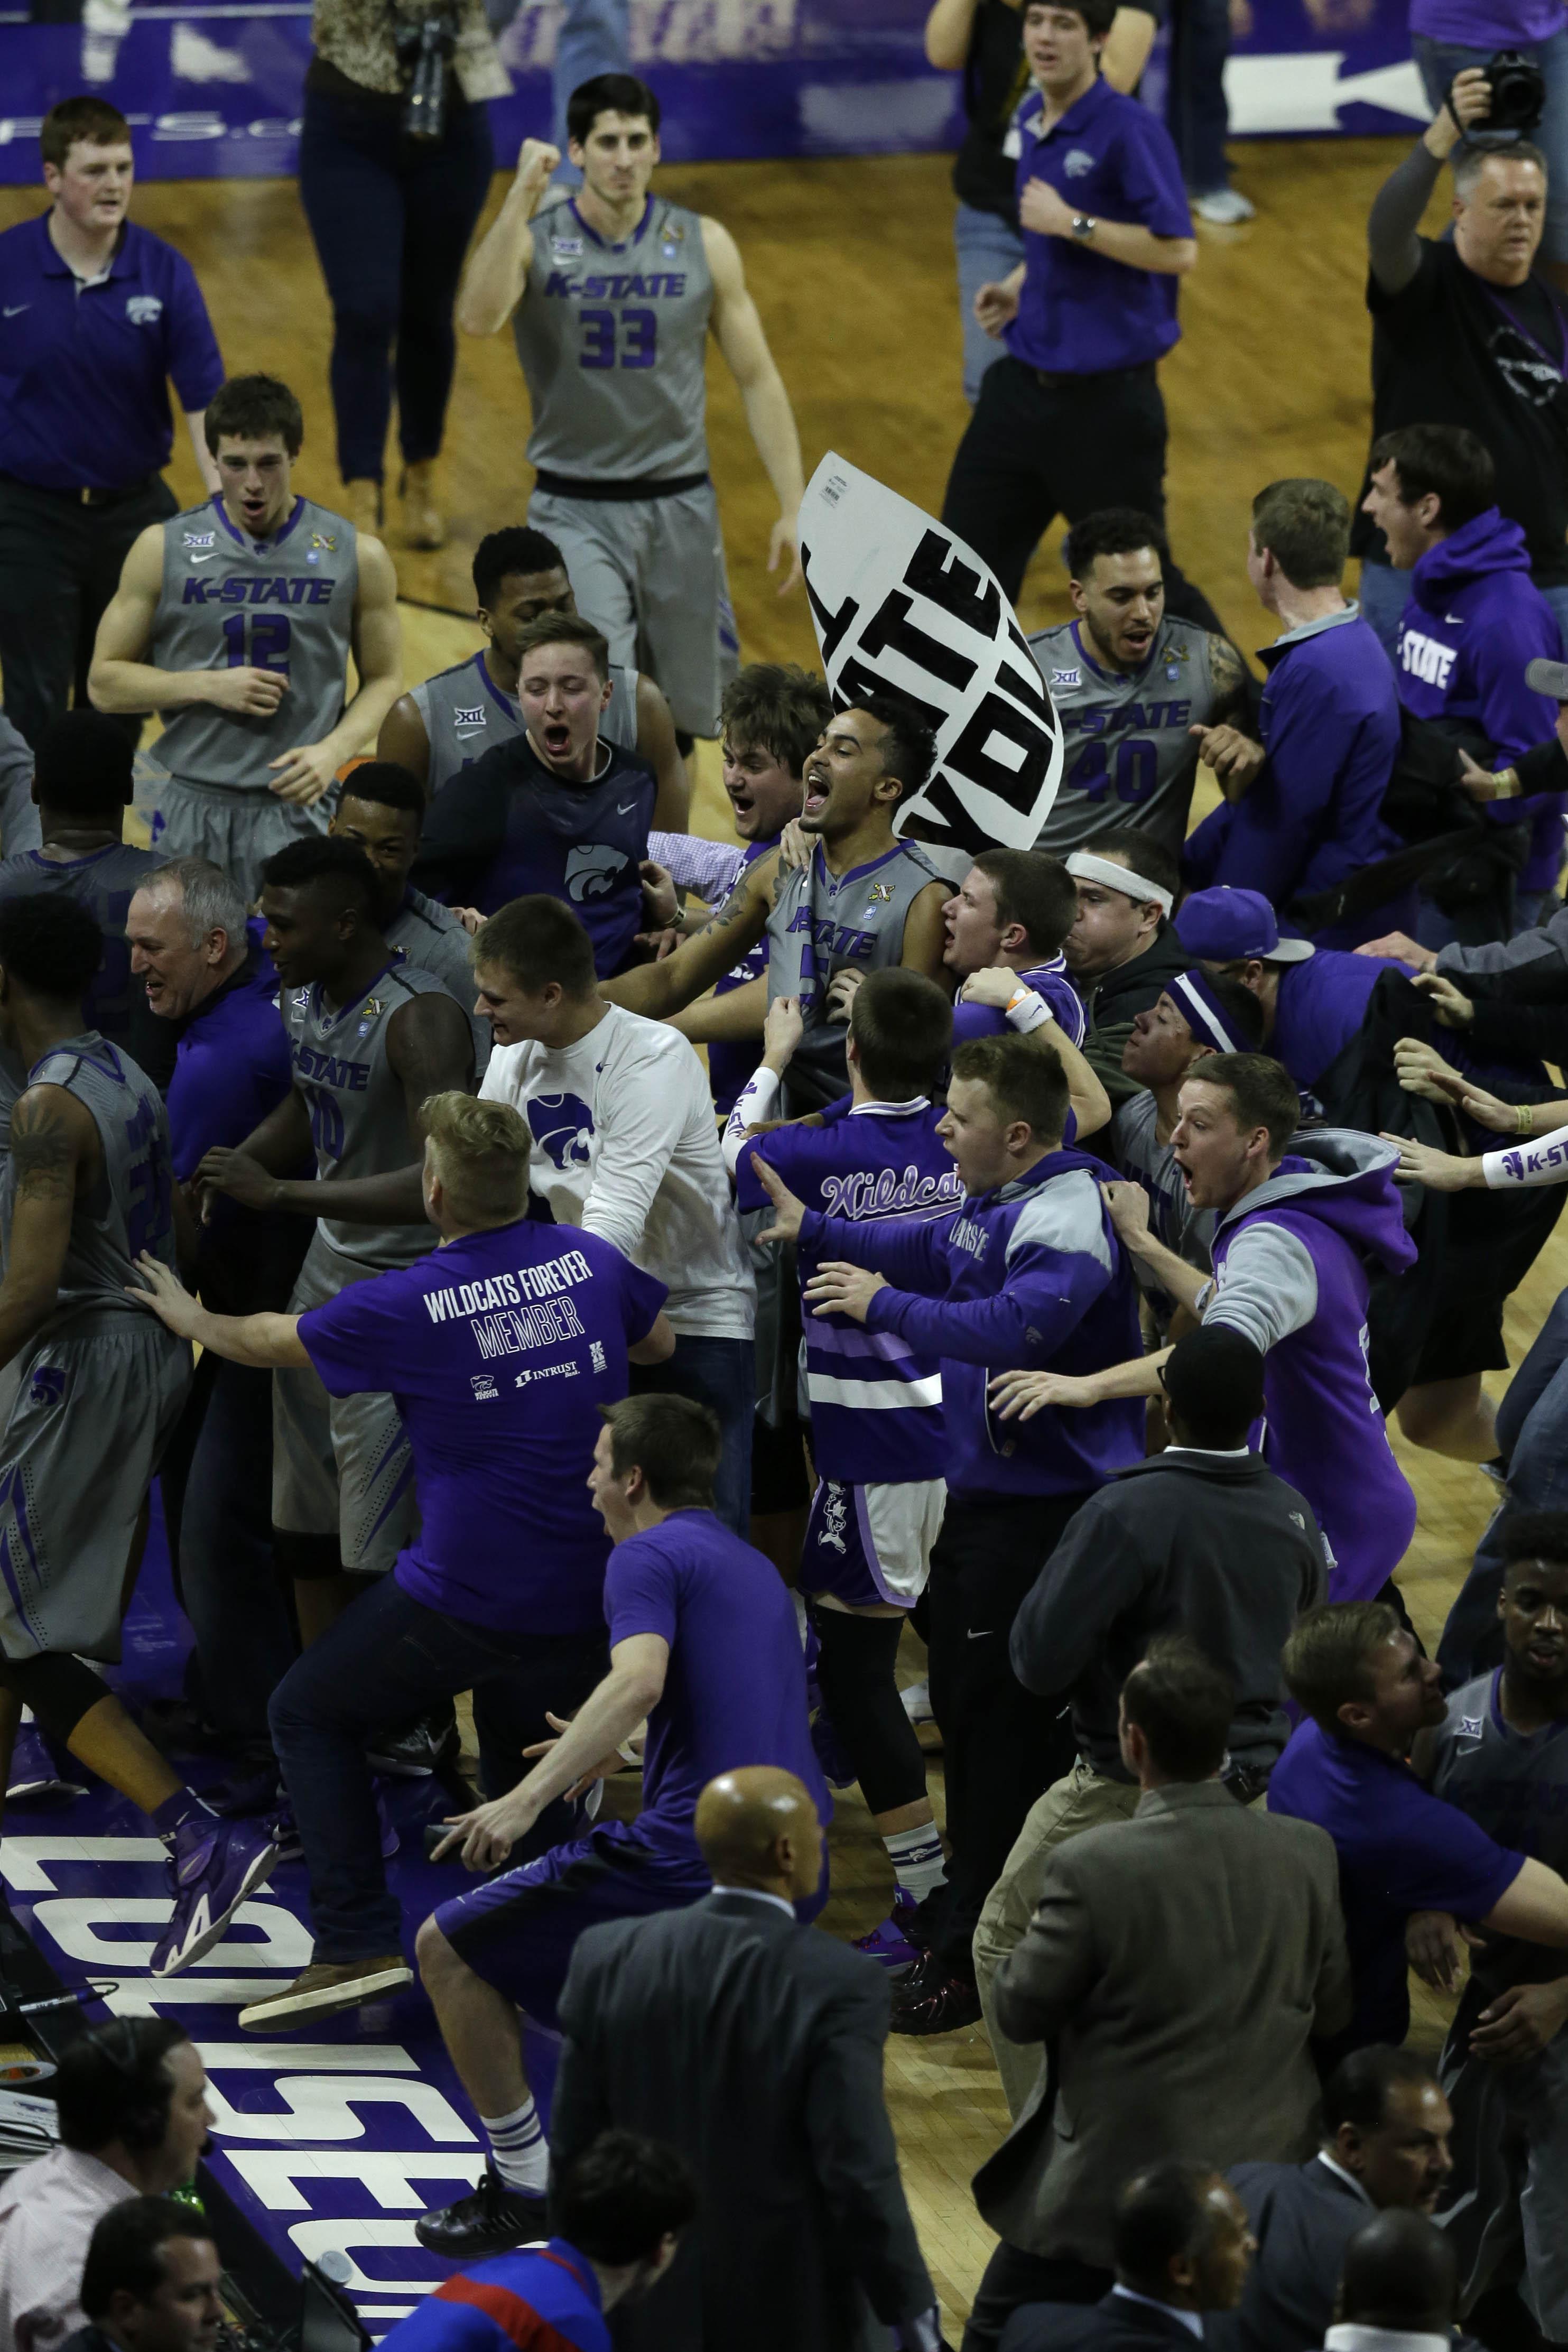 Kansas State players and fans celebrate following an NCAA college basketball game against Kansas at Bramlage Coliseum in Manhattan, Kan., Monday, Feb. 23, 2015. Kansas State defeated Kansas 70-63. (AP Photo/Orlin Wagner)